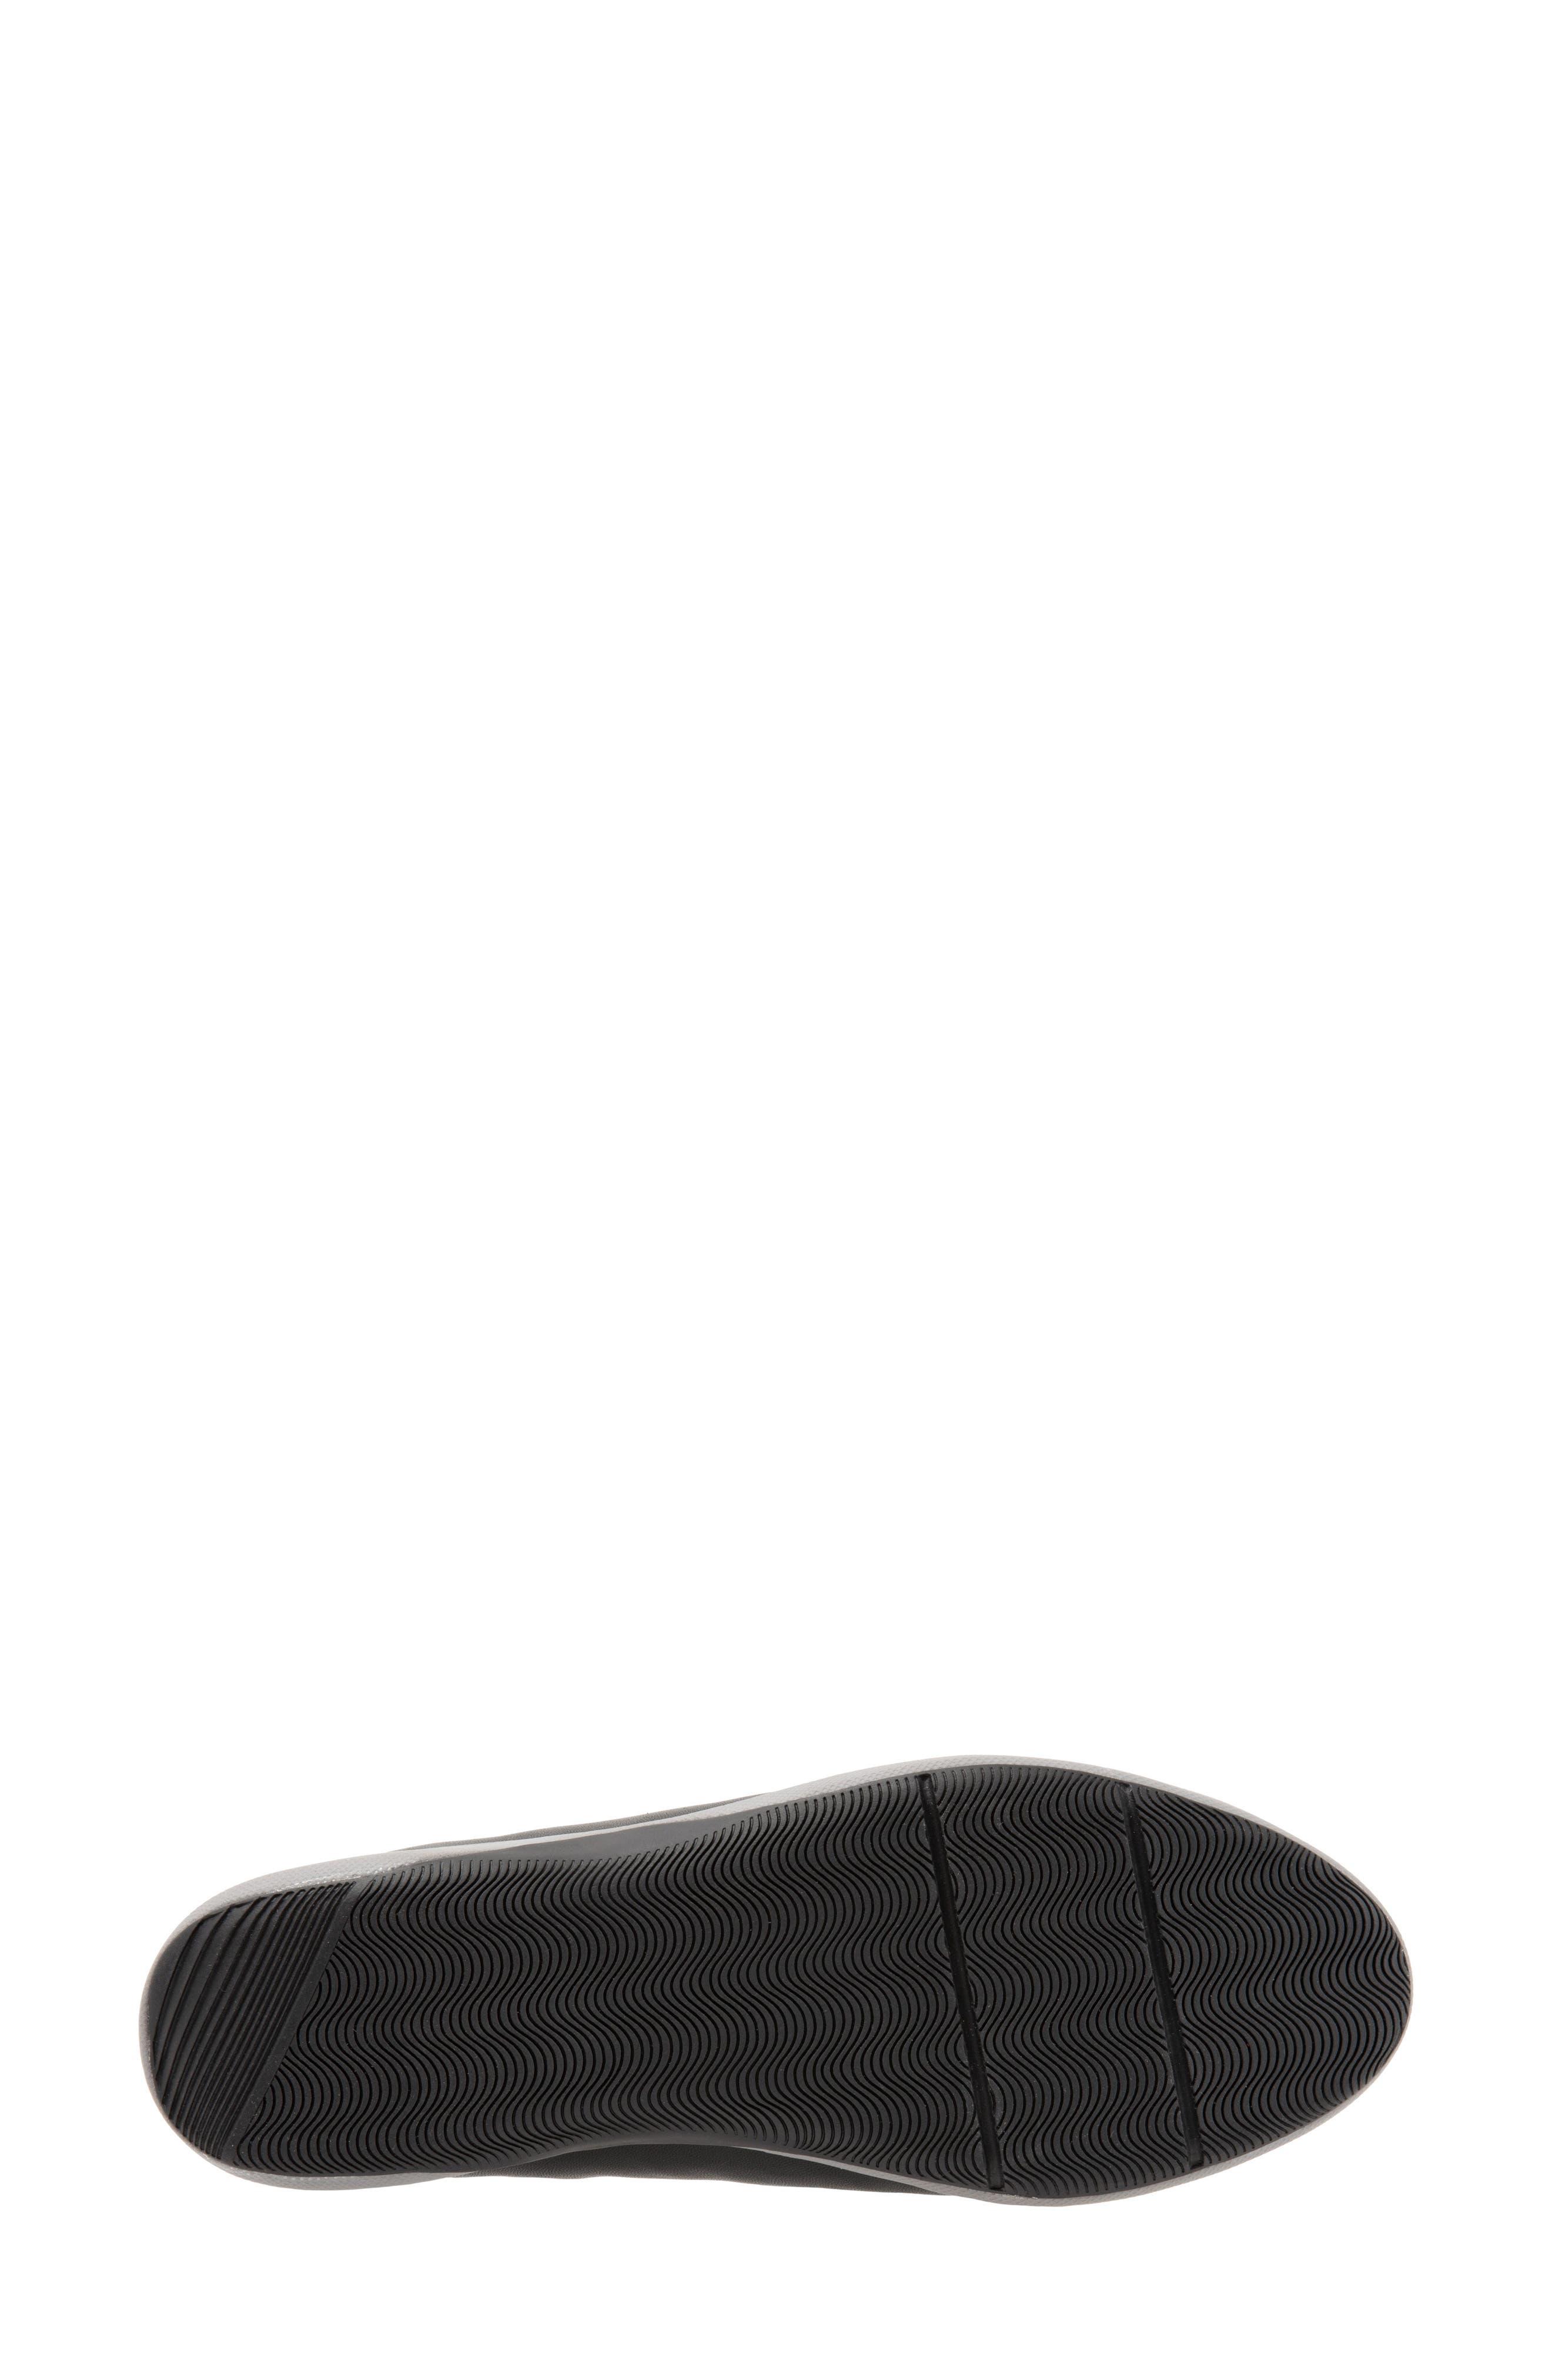 SOFTWALK<SUP>®</SUP>, SAVA Haven Sneaker, Alternate thumbnail 6, color, BLACK/ GREY LEATHER